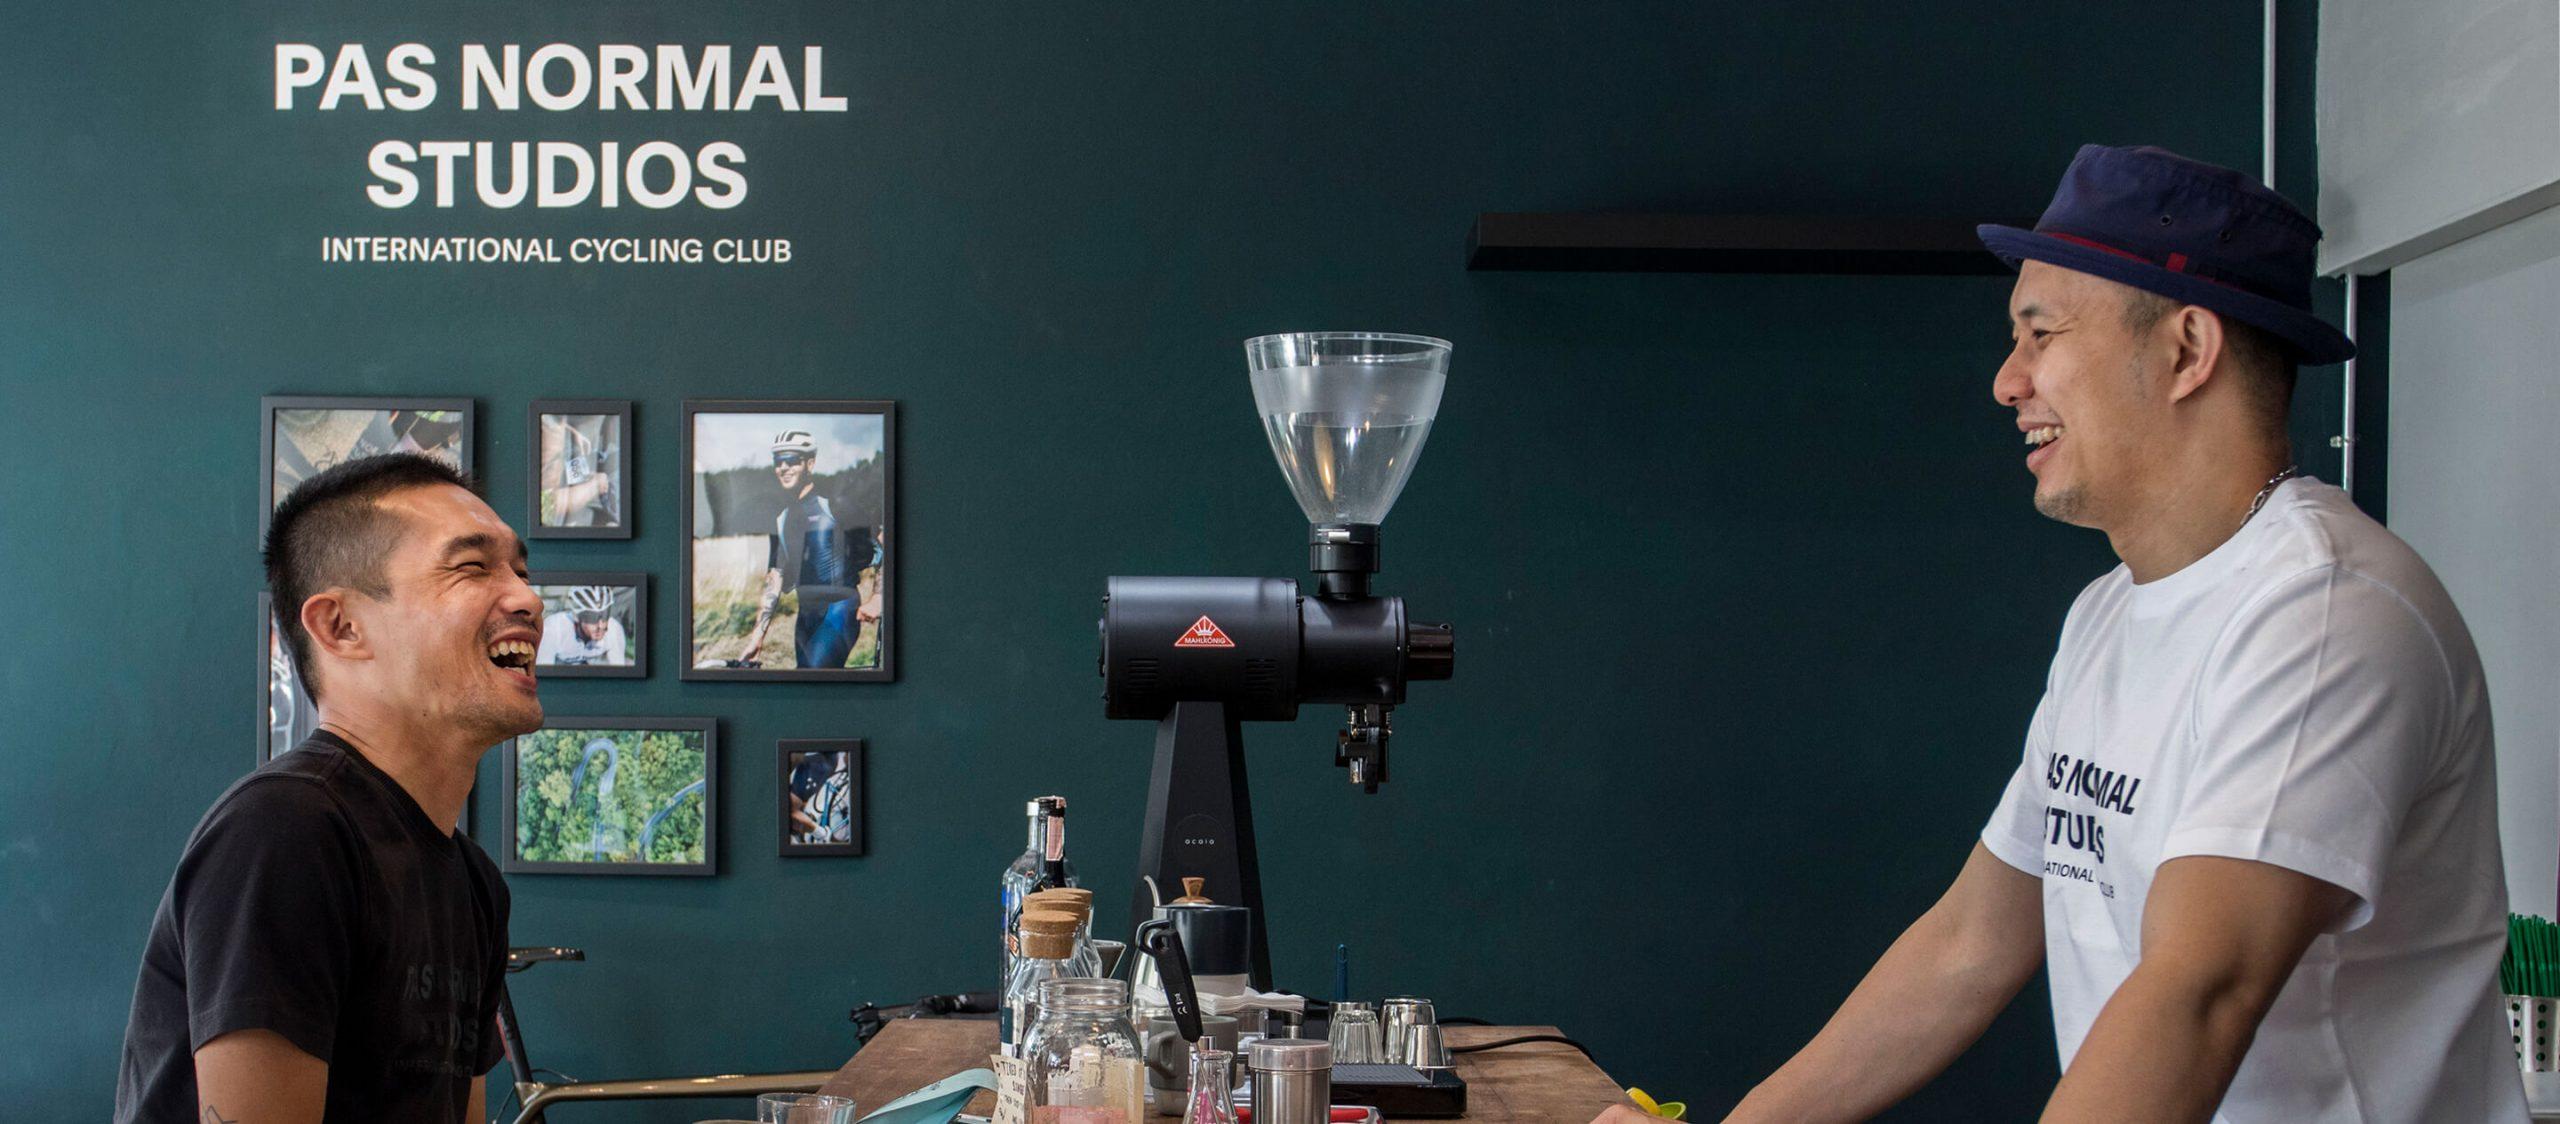 One Two Two Coffee Bar x Pas Normal Studios : คาเฟ่และช็อปเสื้อจักรยานสุดซิ่งที่อยากเอาใจเพื่อนนักปั่นทุกสาย